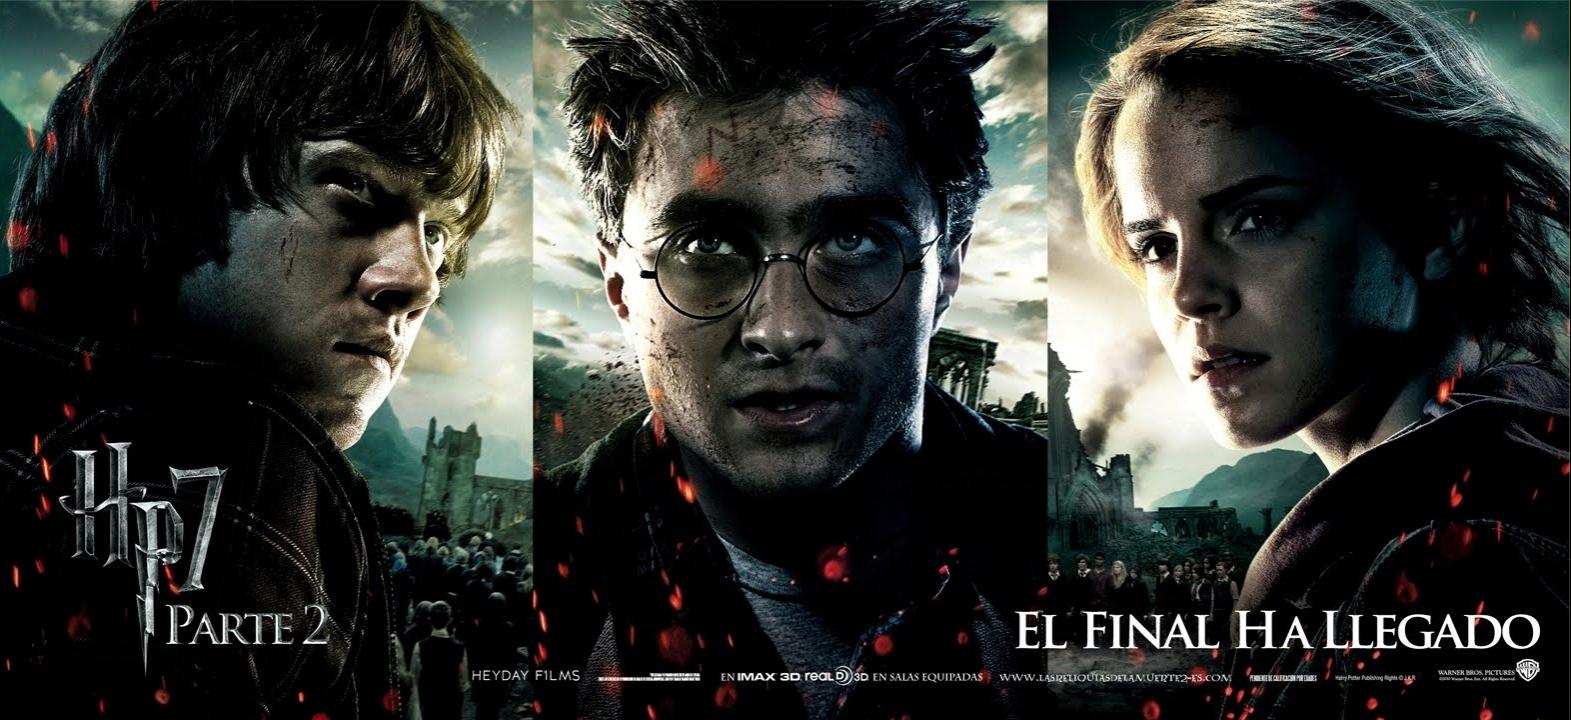 Daniel Radcliffe as Harry Potter, Emma Watson as Hermione Granger and Rupert Grint as Ron Weasley